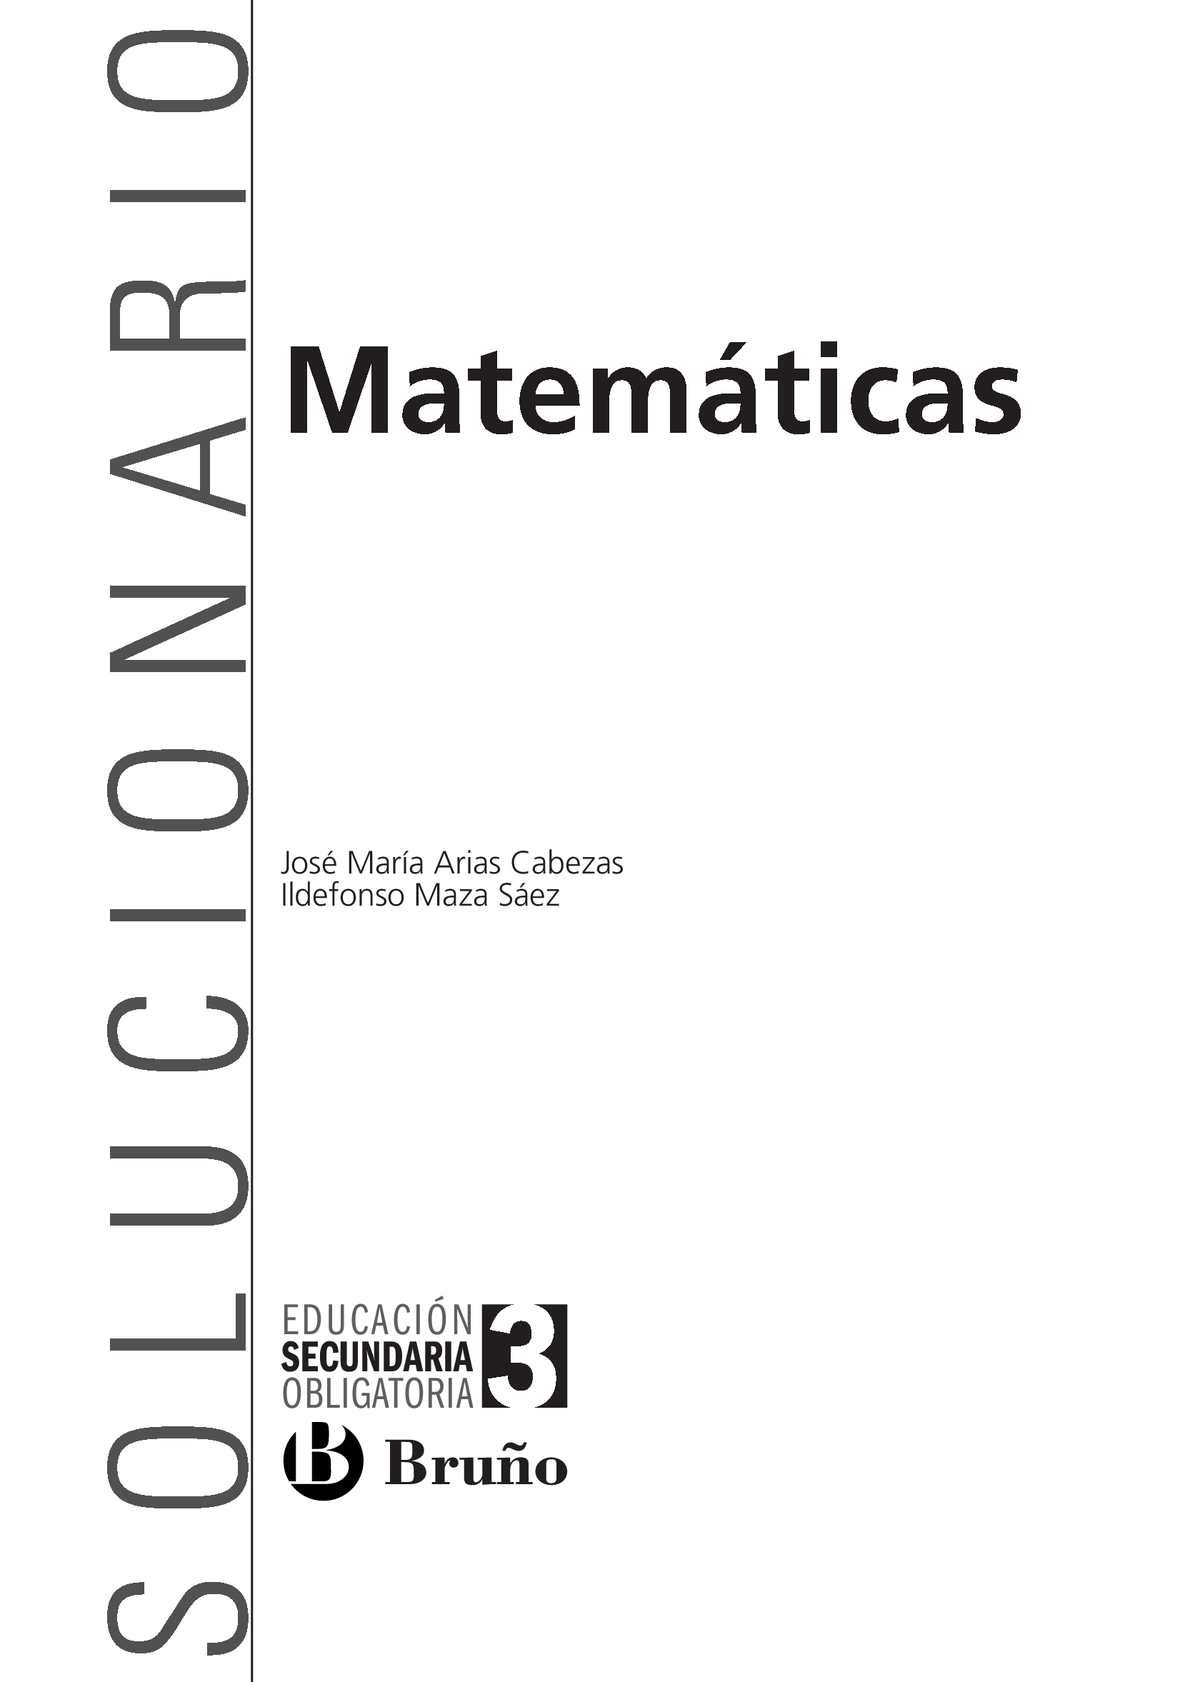 Calaméo - Solucionario Matemáticas 3º de ESO Bruño